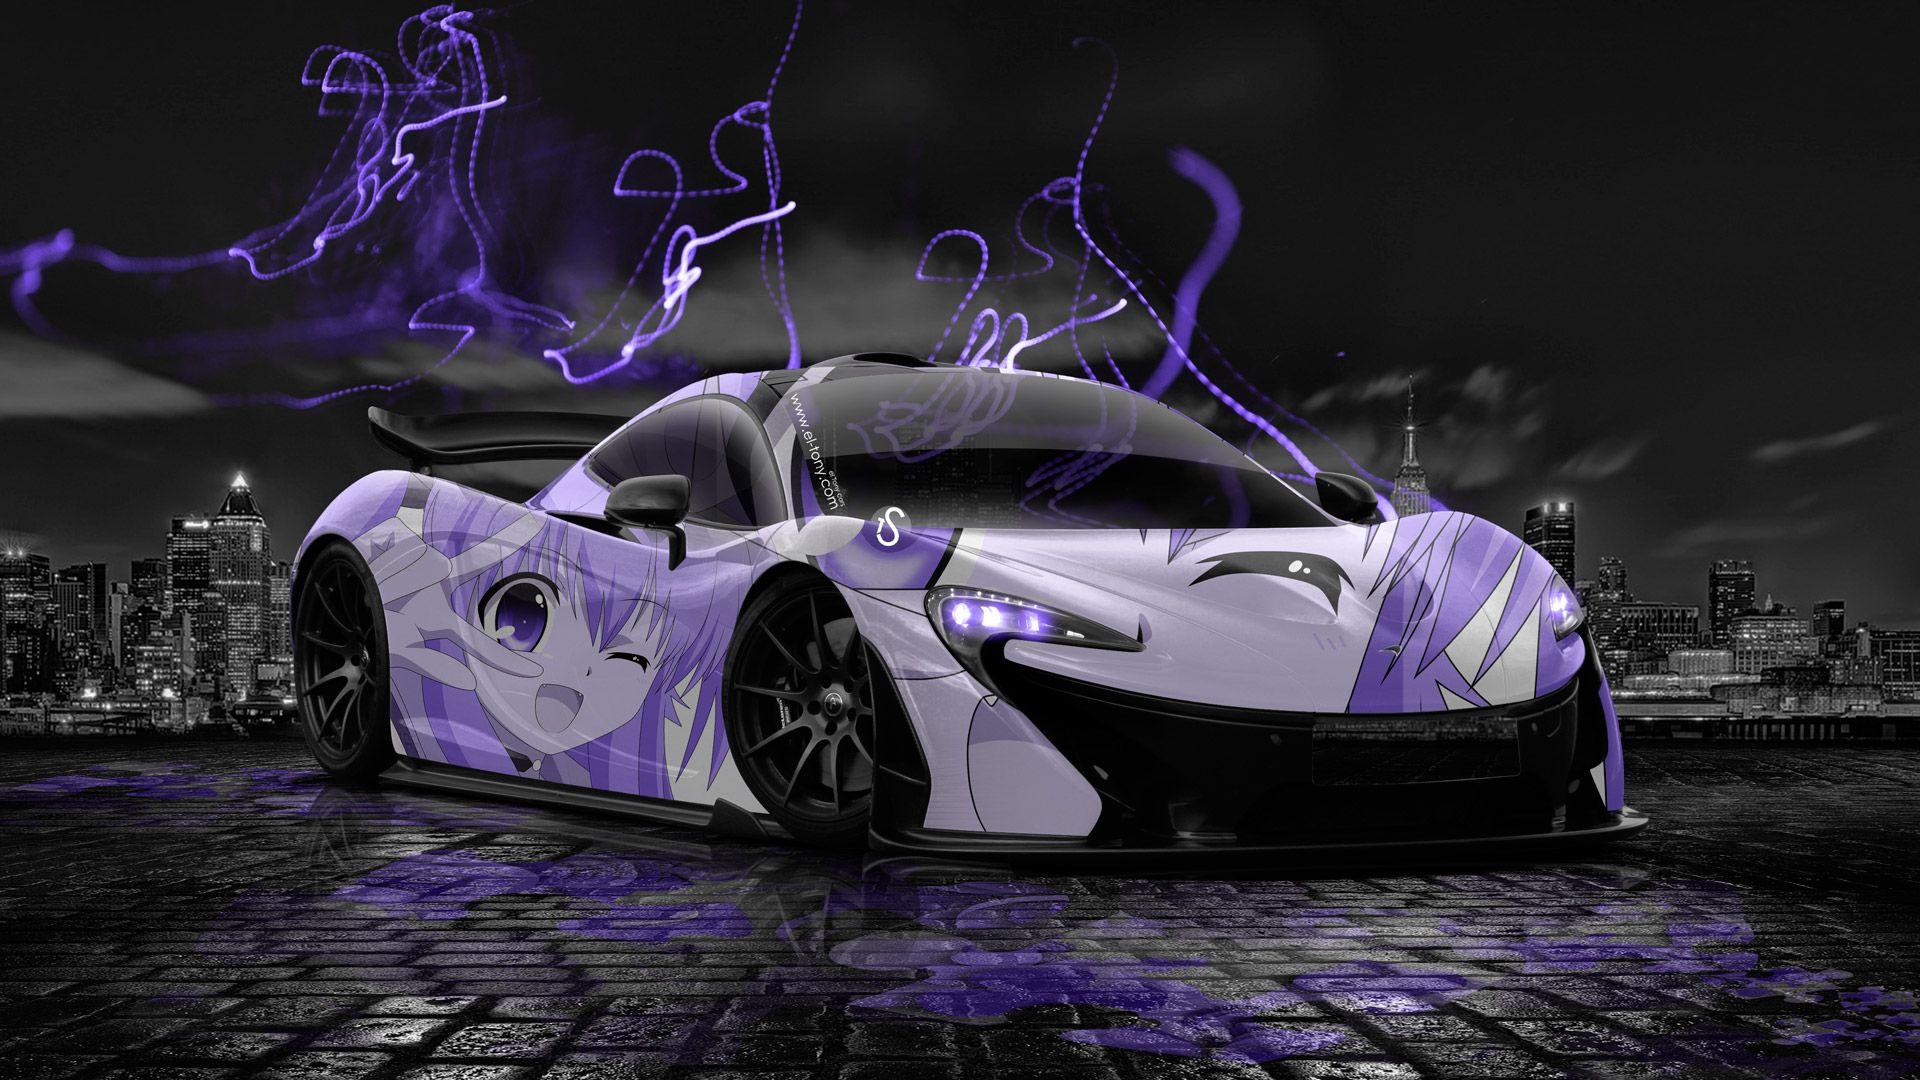 McLaren P1 Anime Aerography City Car 2014